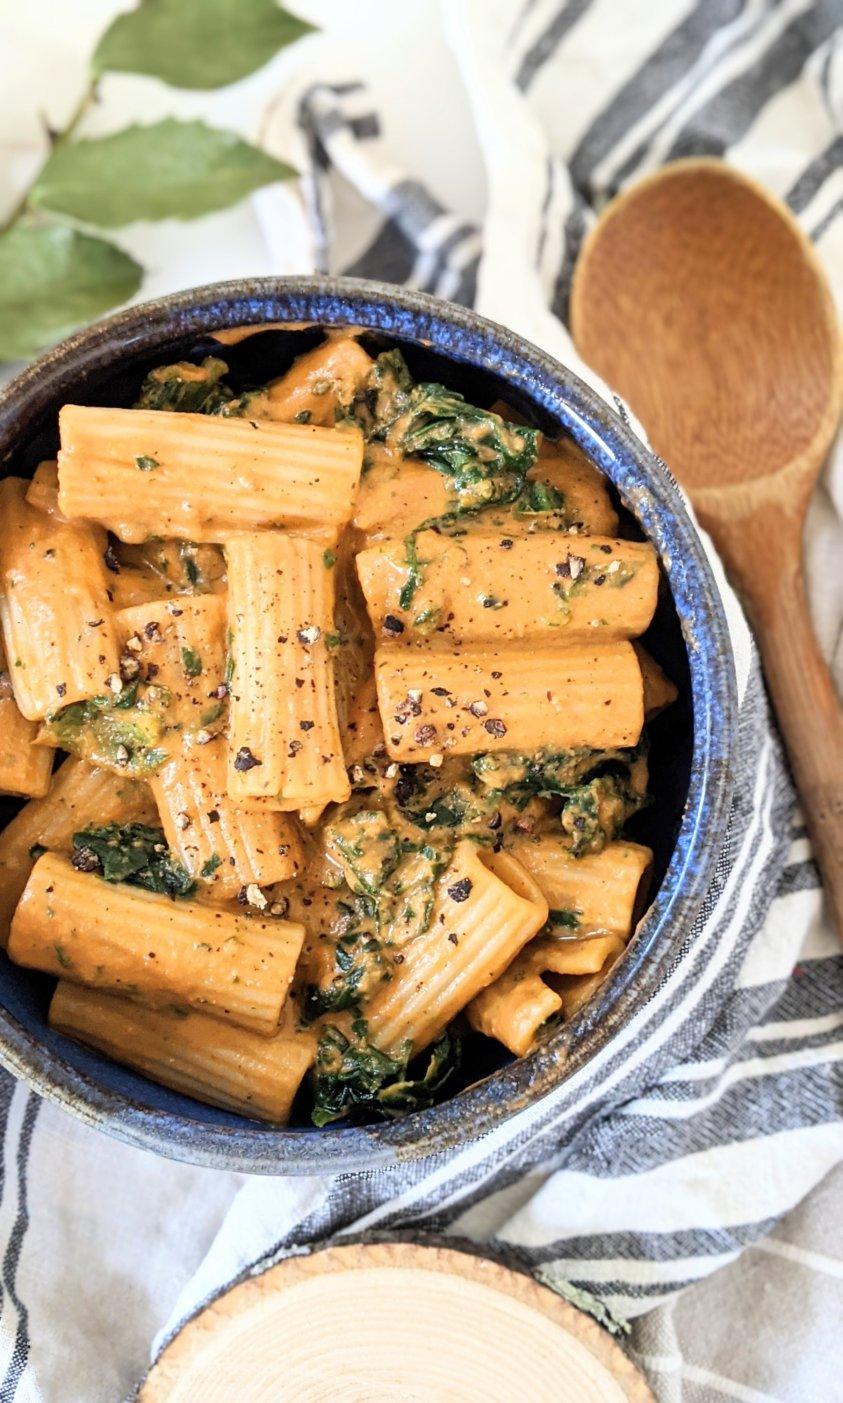 creamy vegan tomato spinach pasta recipe healthy inexpensive pasta recipes vegan vegetarian plant based creamy tofu tomato sauce recipe healthy italian recipes plant based